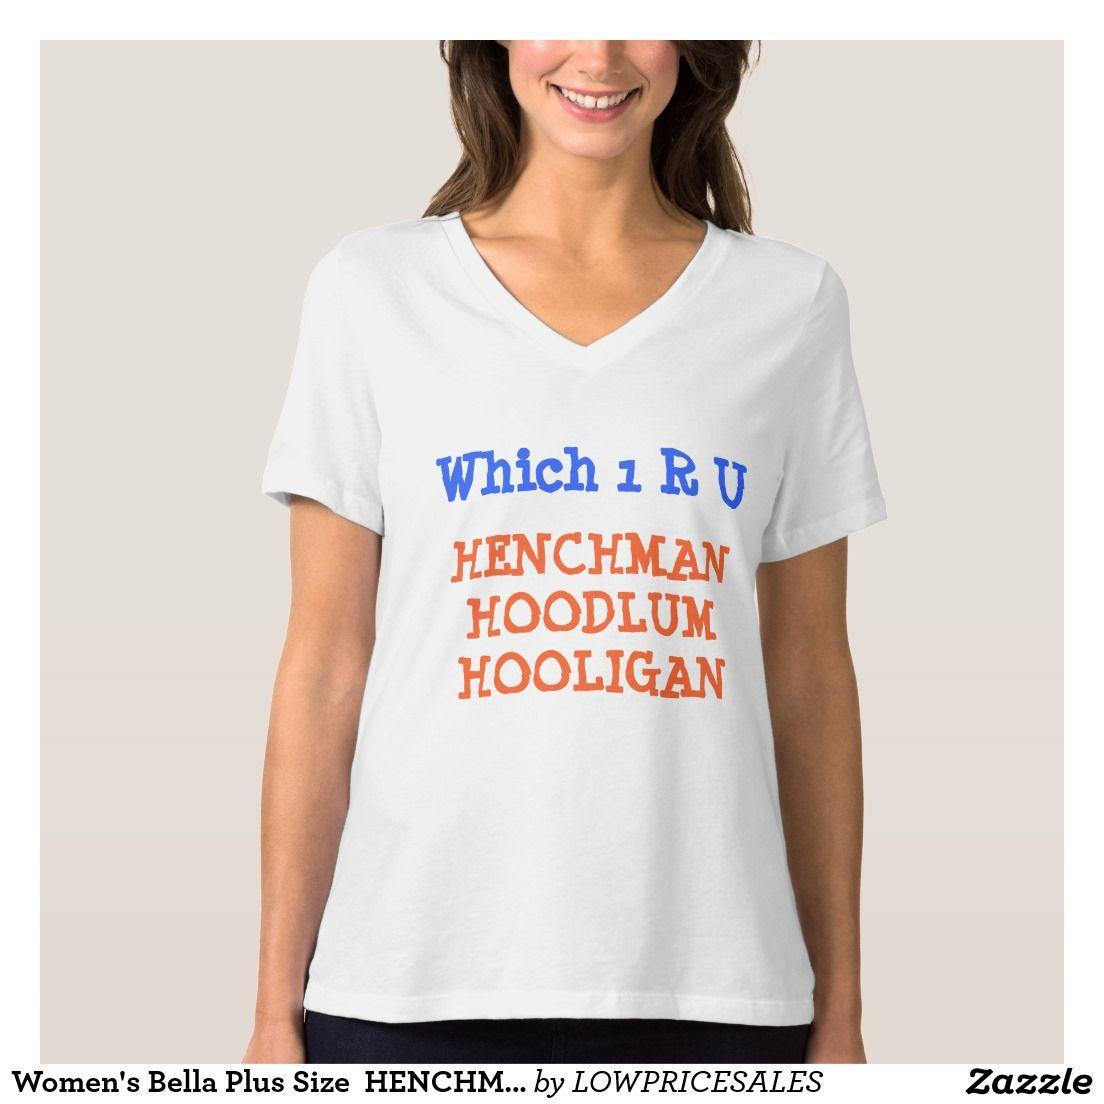 Zazzle t shirt design size - Women S Bella Plus Size Henchman Hoodlum Hooligan T Shirt